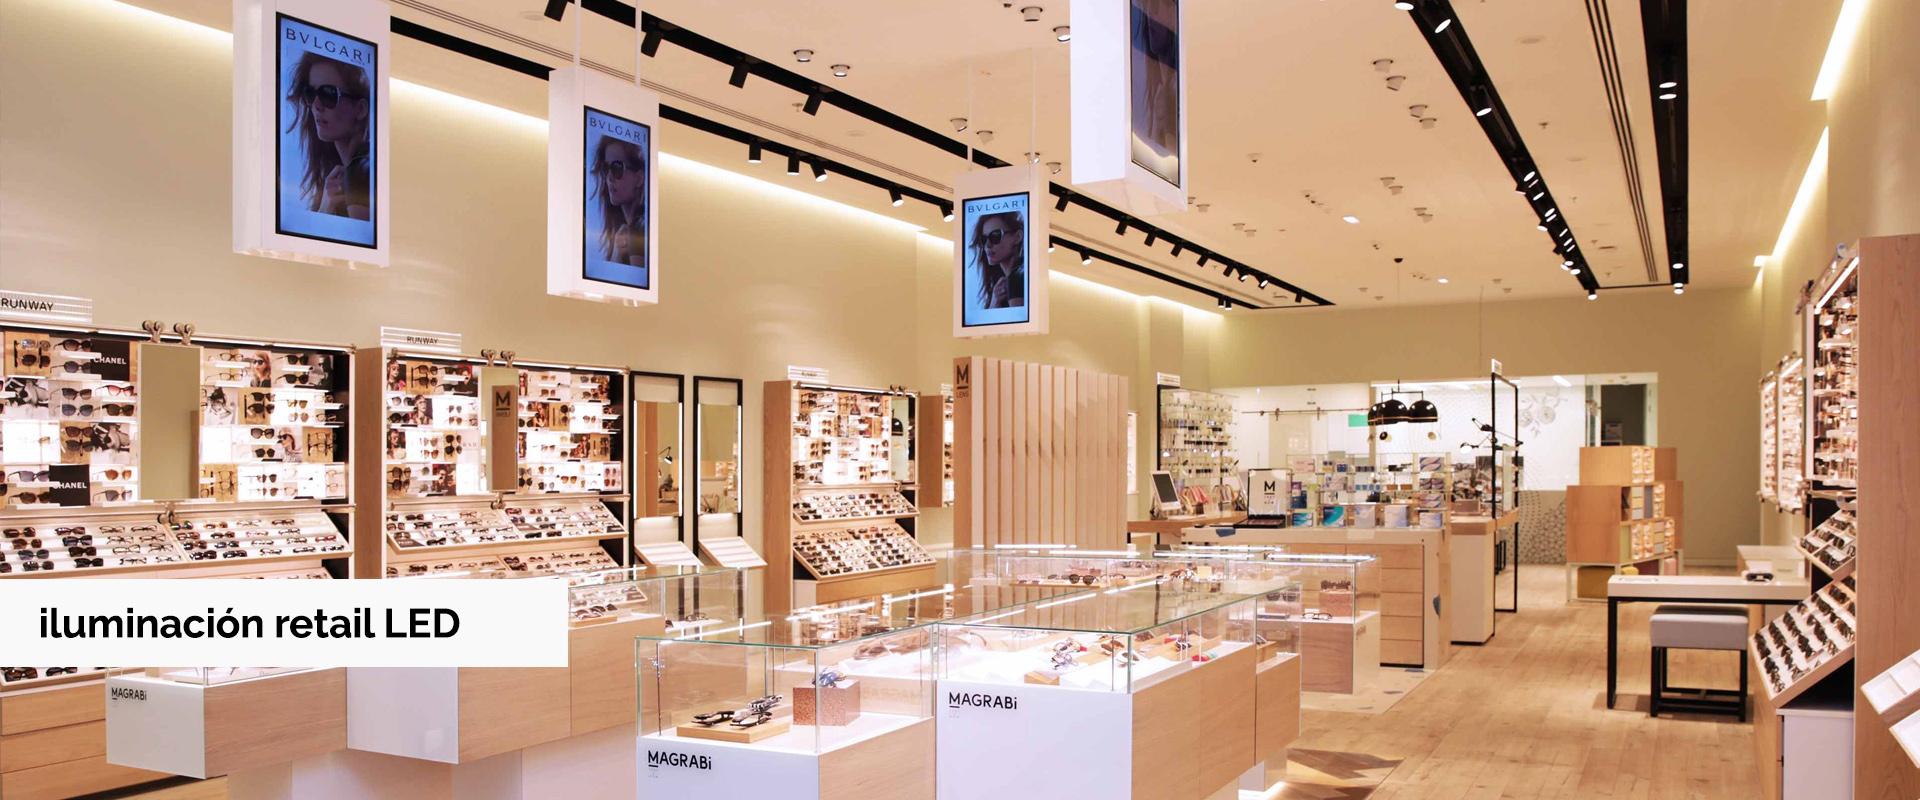 iluminacion-retail-isolux.jpg